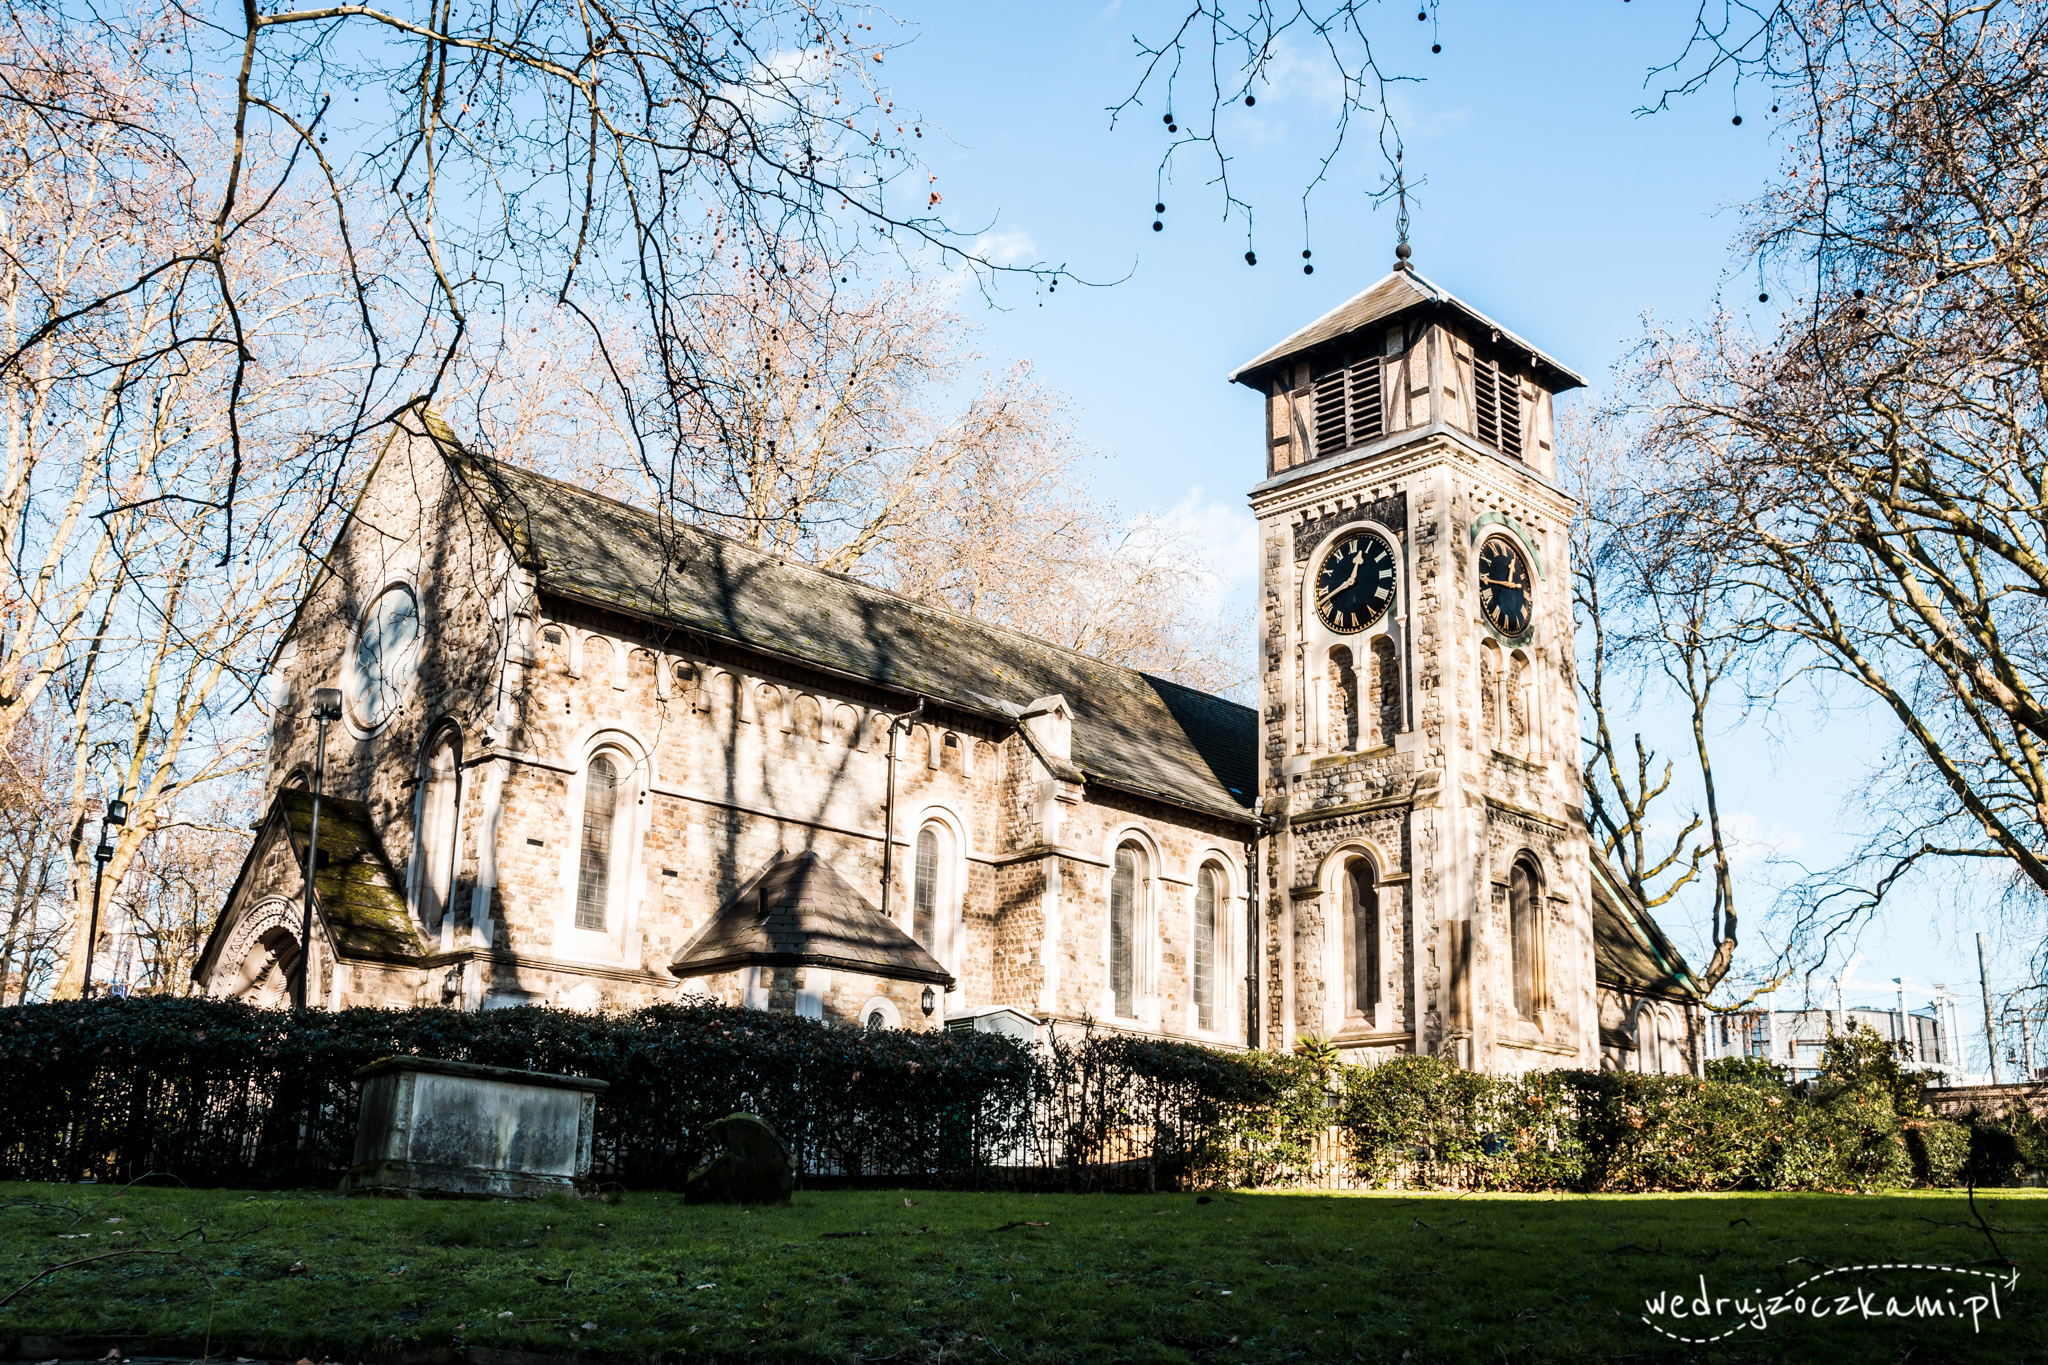 St. Pancras Old Church